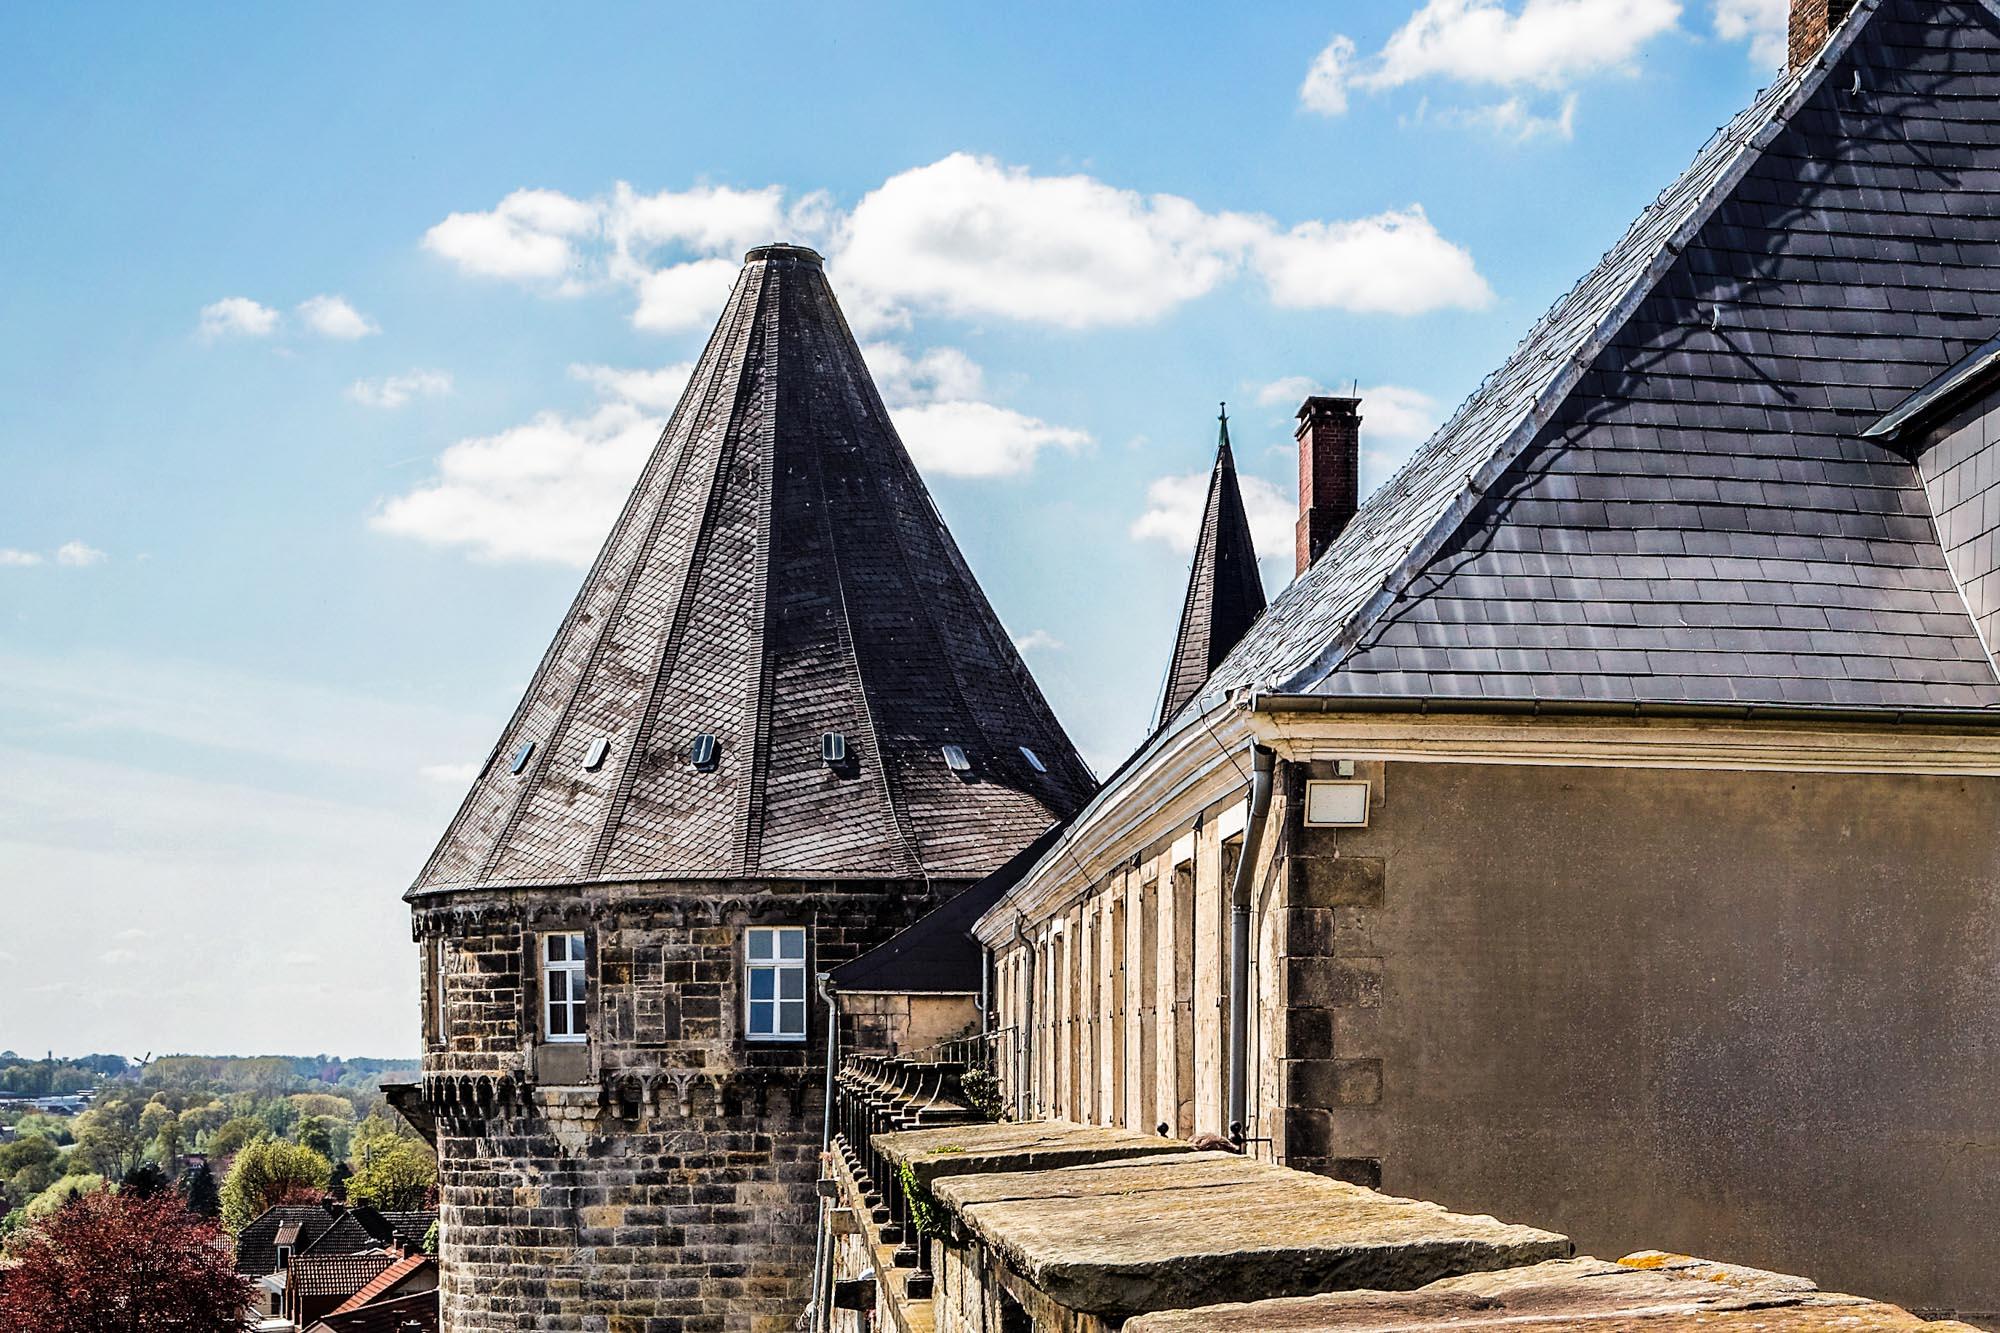 Der Batterieturm der Burg Bentheim © Andreas Richter